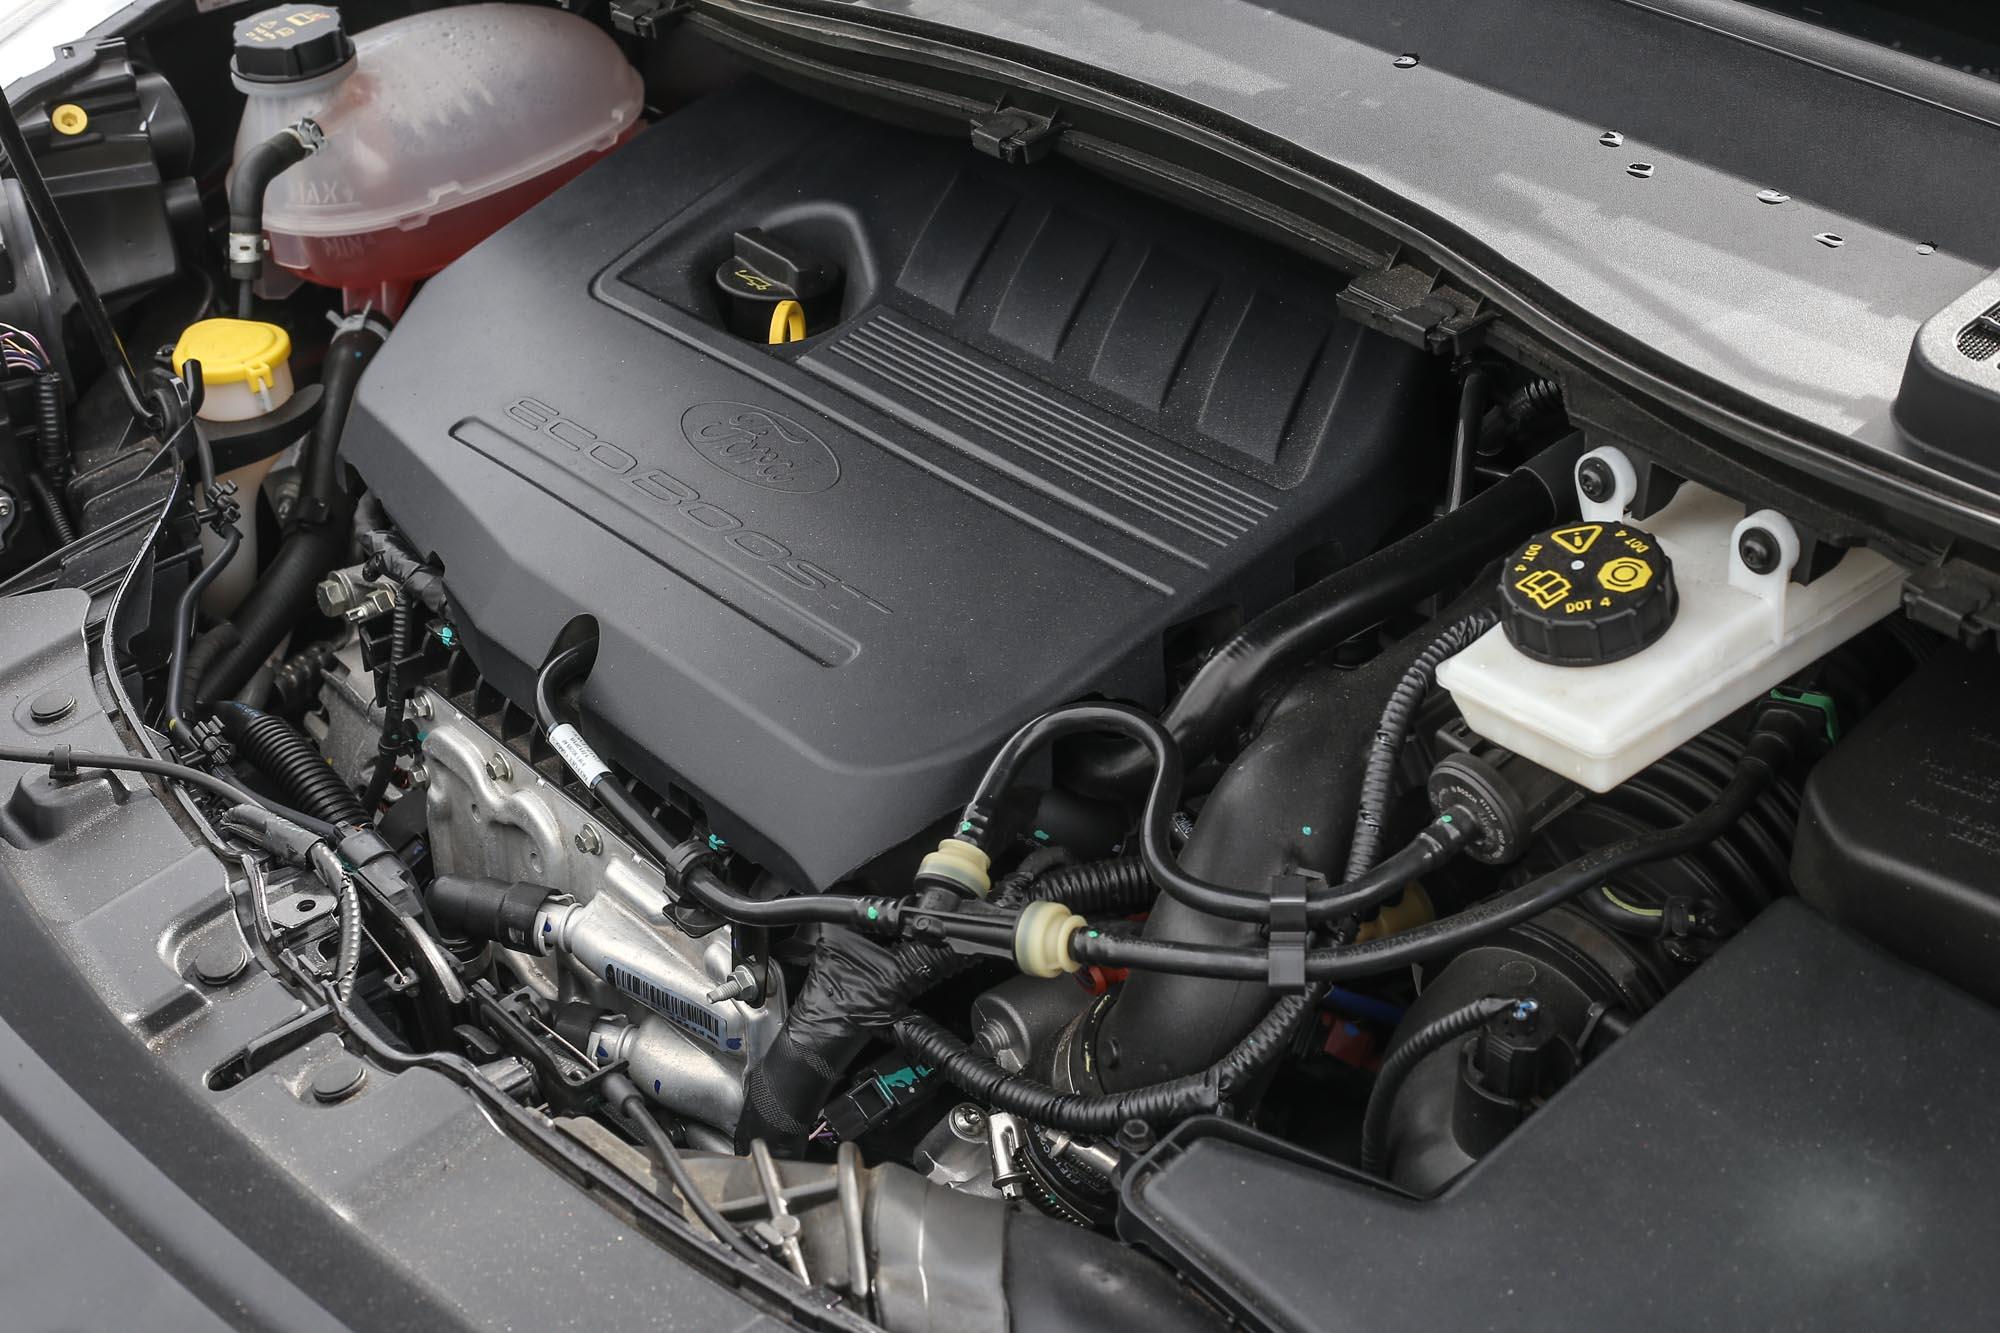 Kuga EcoBoost182 CP360 搭載1.5升渦輪增壓直列四缸汽油引擎,具備有 182ps/6000rpm 最大馬力與 24.5kgm/1600~5000rpm 最大扭力輸出。